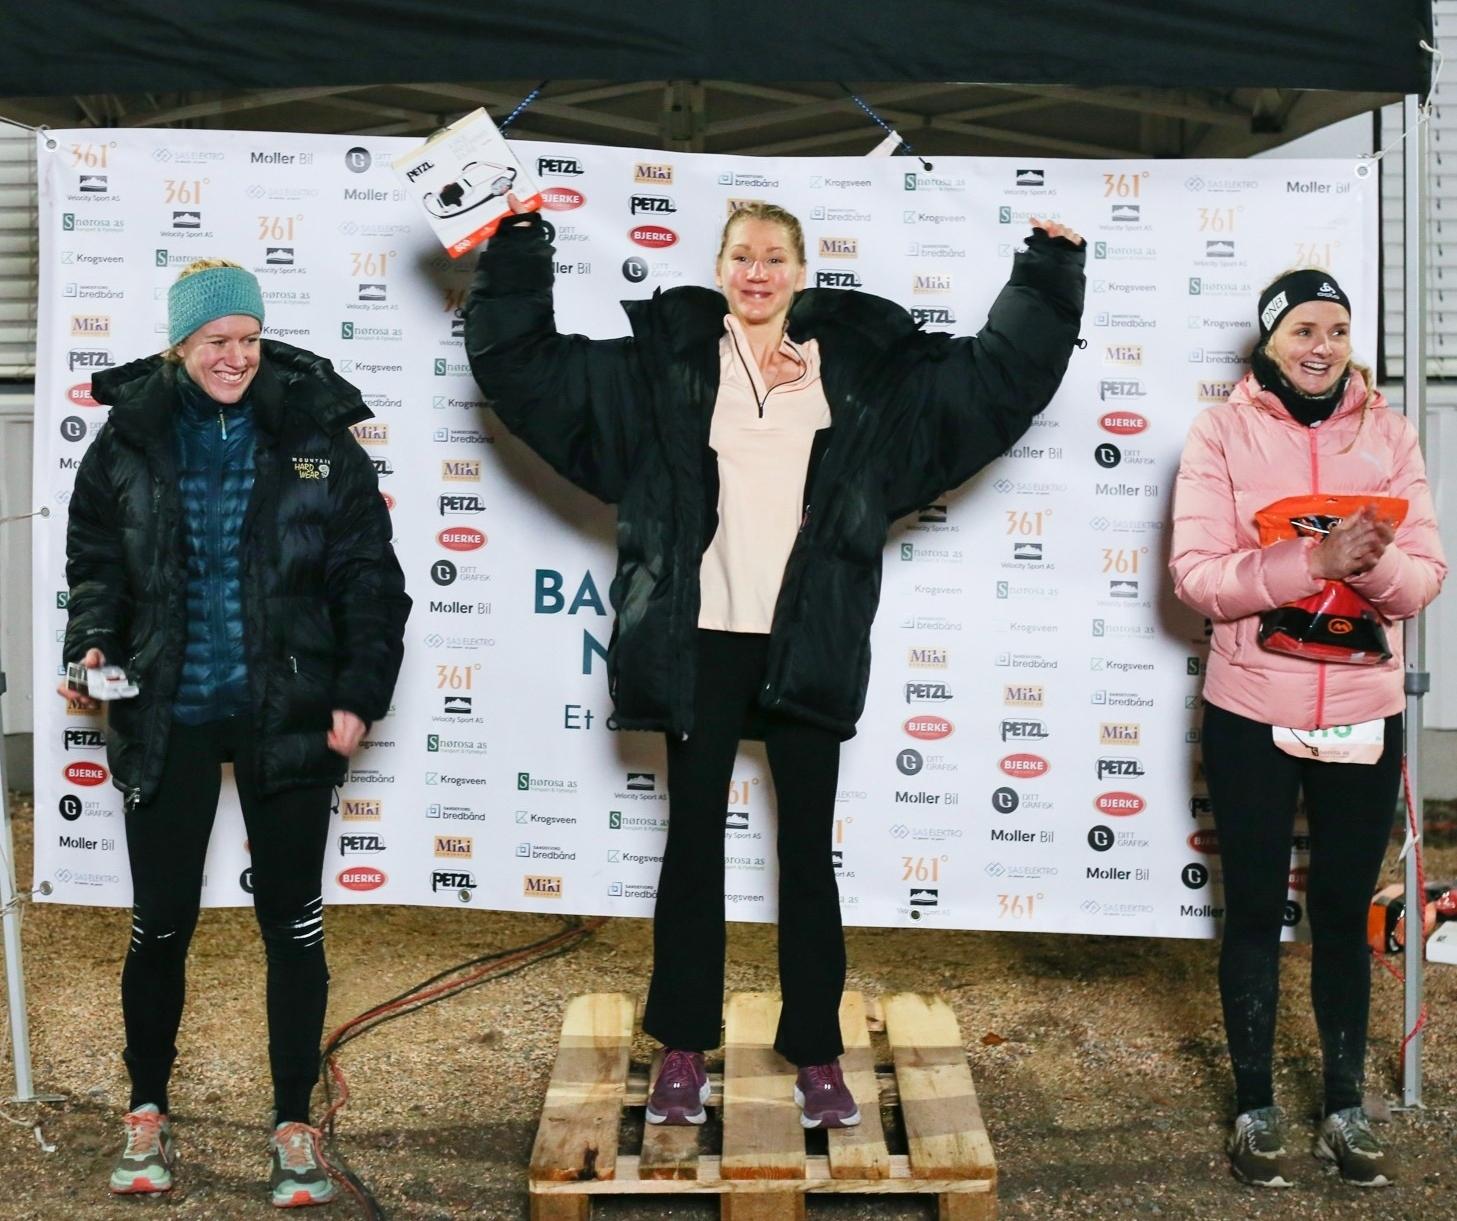 Topp3kvinner-siste-runde_FOTO-Nikita-Solenov.jpg